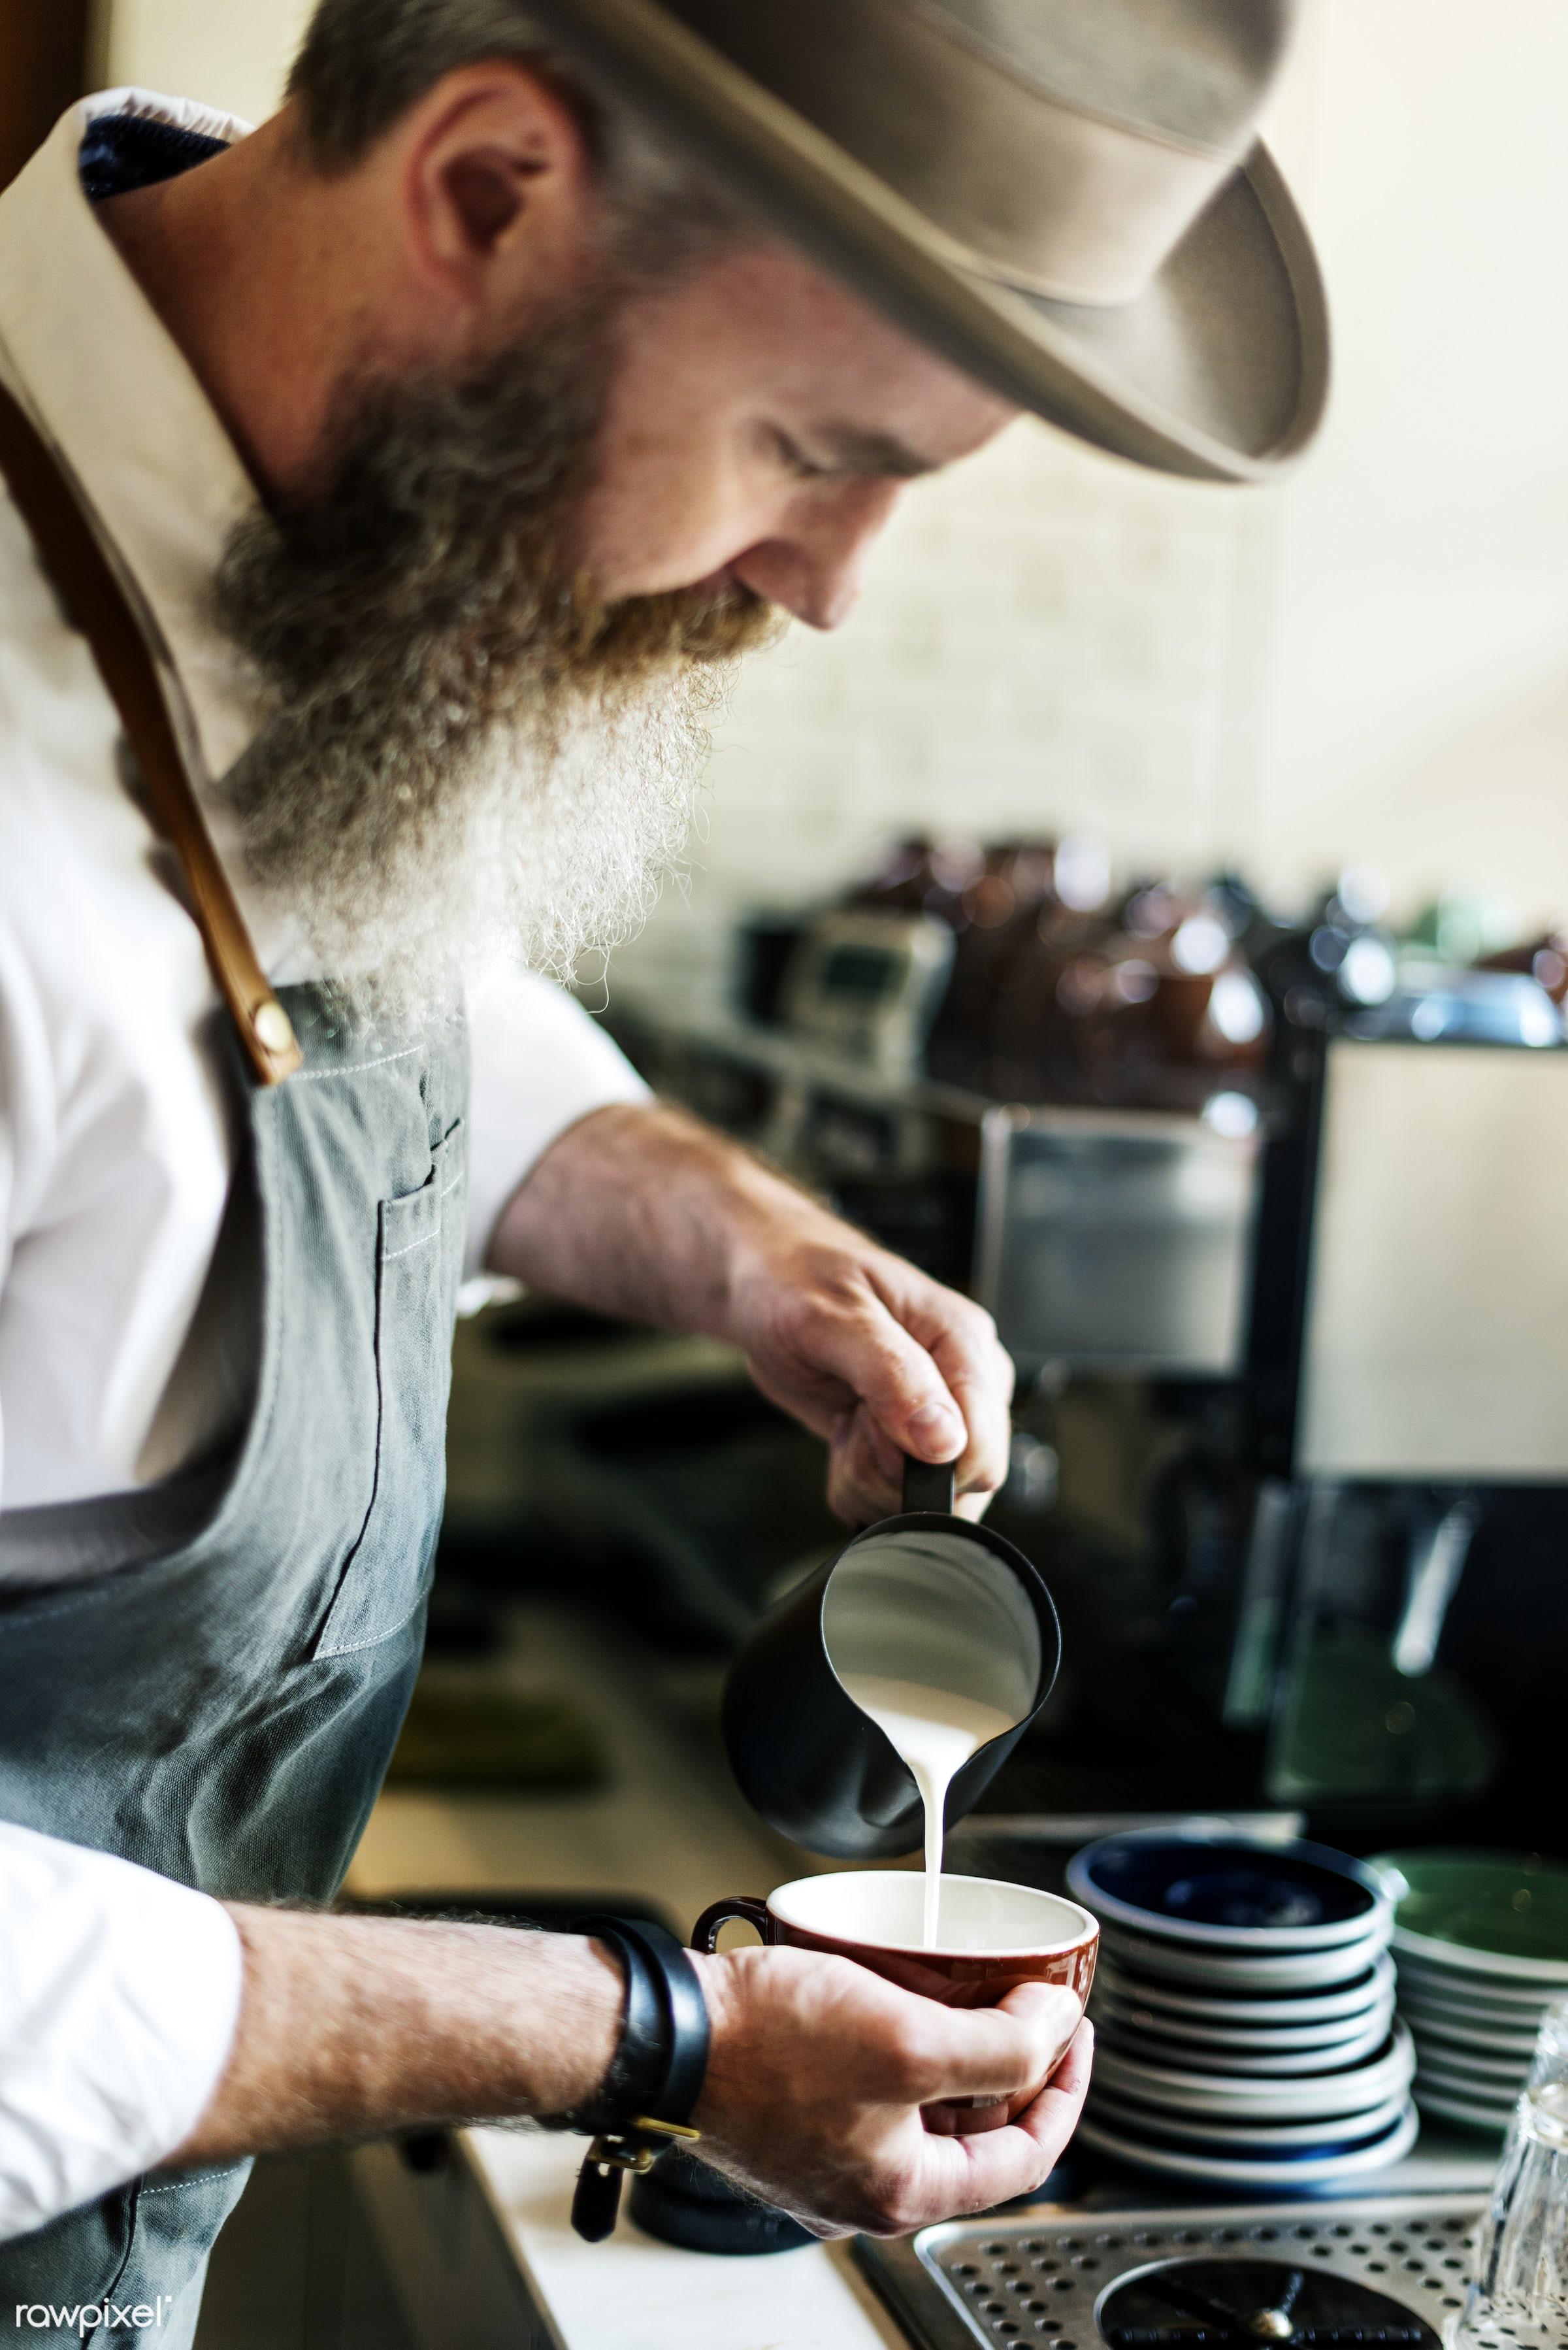 Barista is making coffee - alone, barista, beverage, career, caucasian, closeup, coffee, coffee shop, cups, drink, hands,...